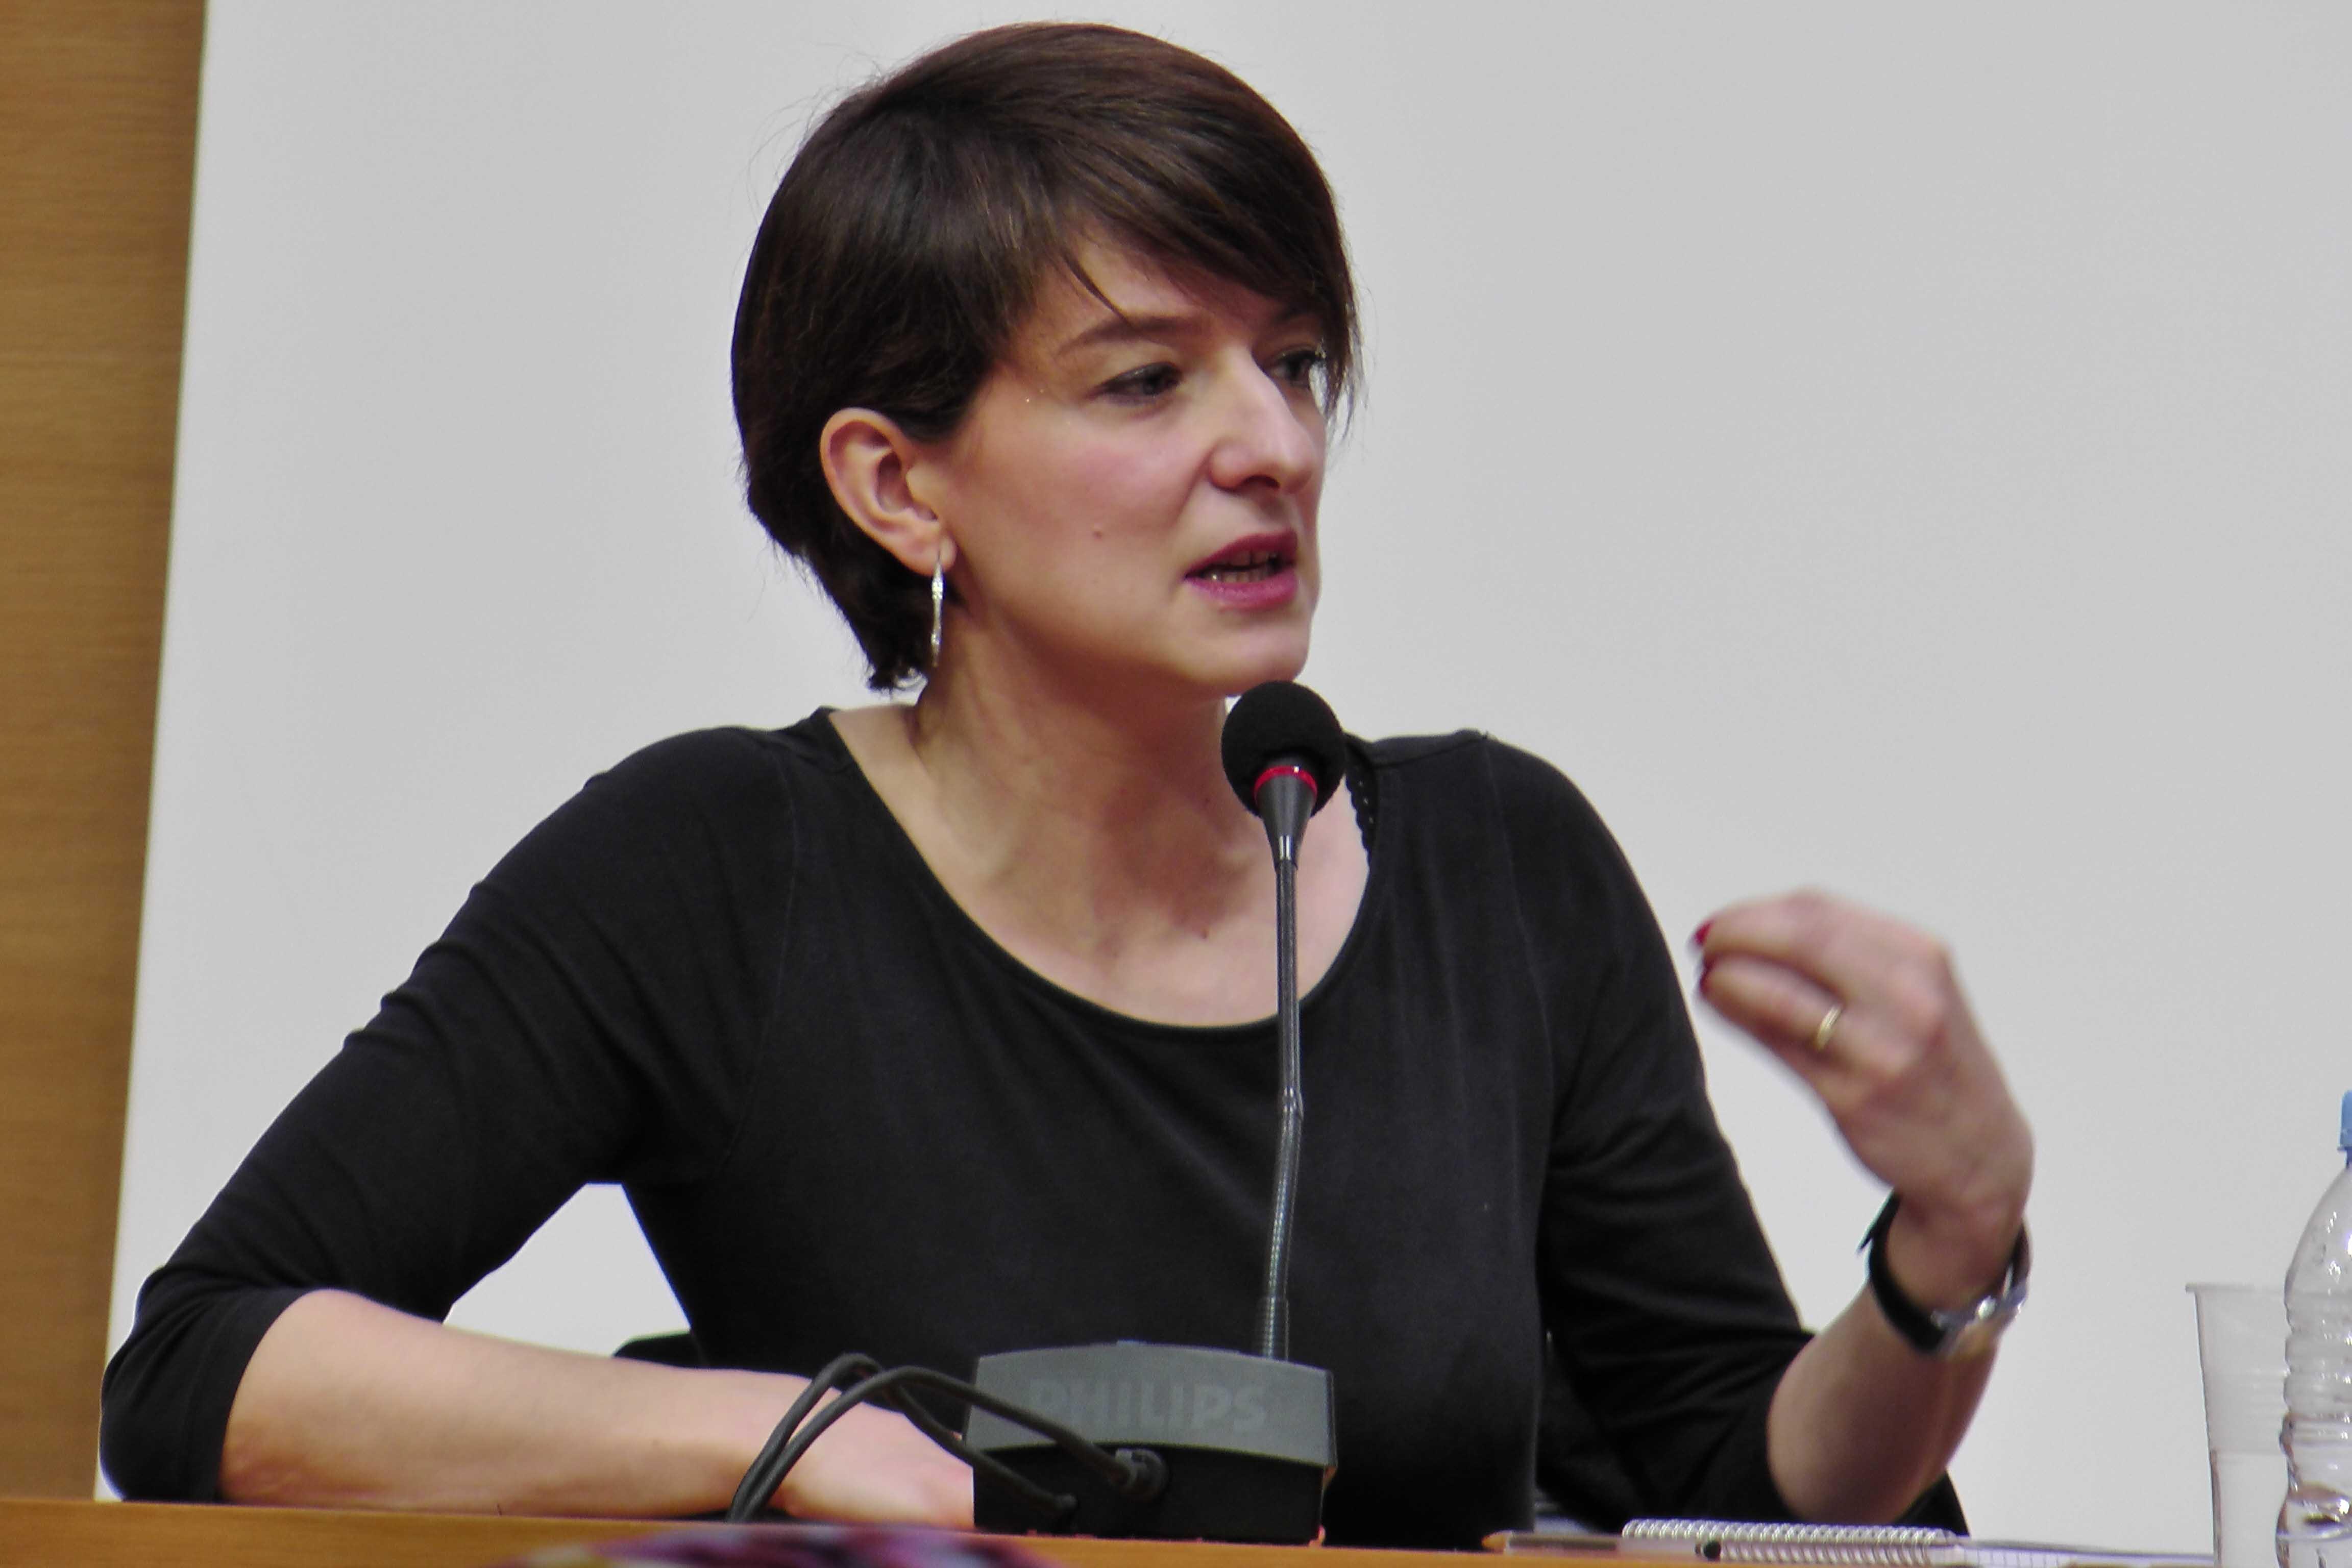 Séverine Kodjo-Grandvaux